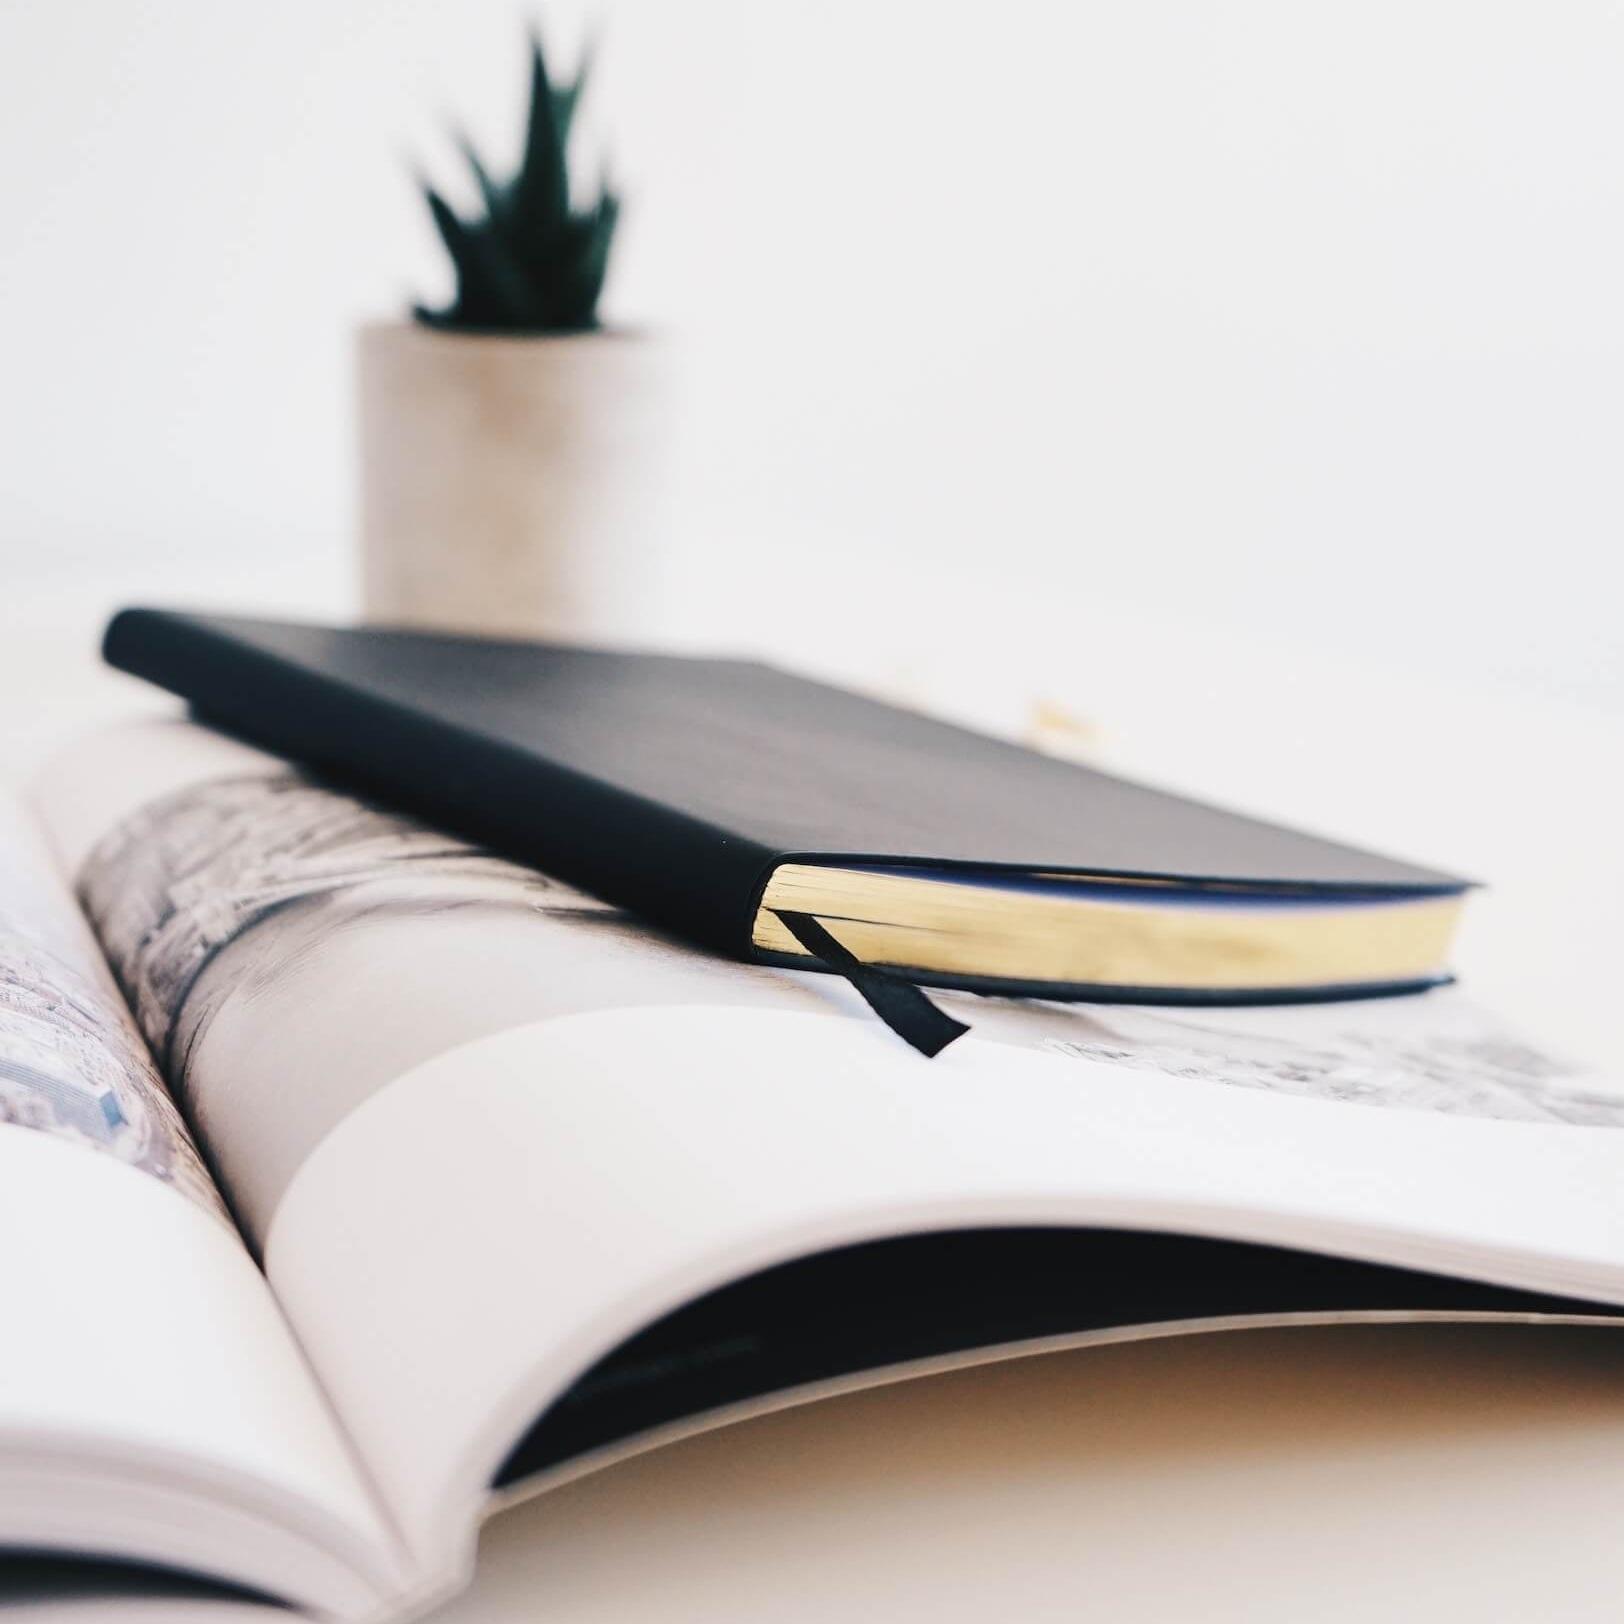 notebook-on-desk.jpg